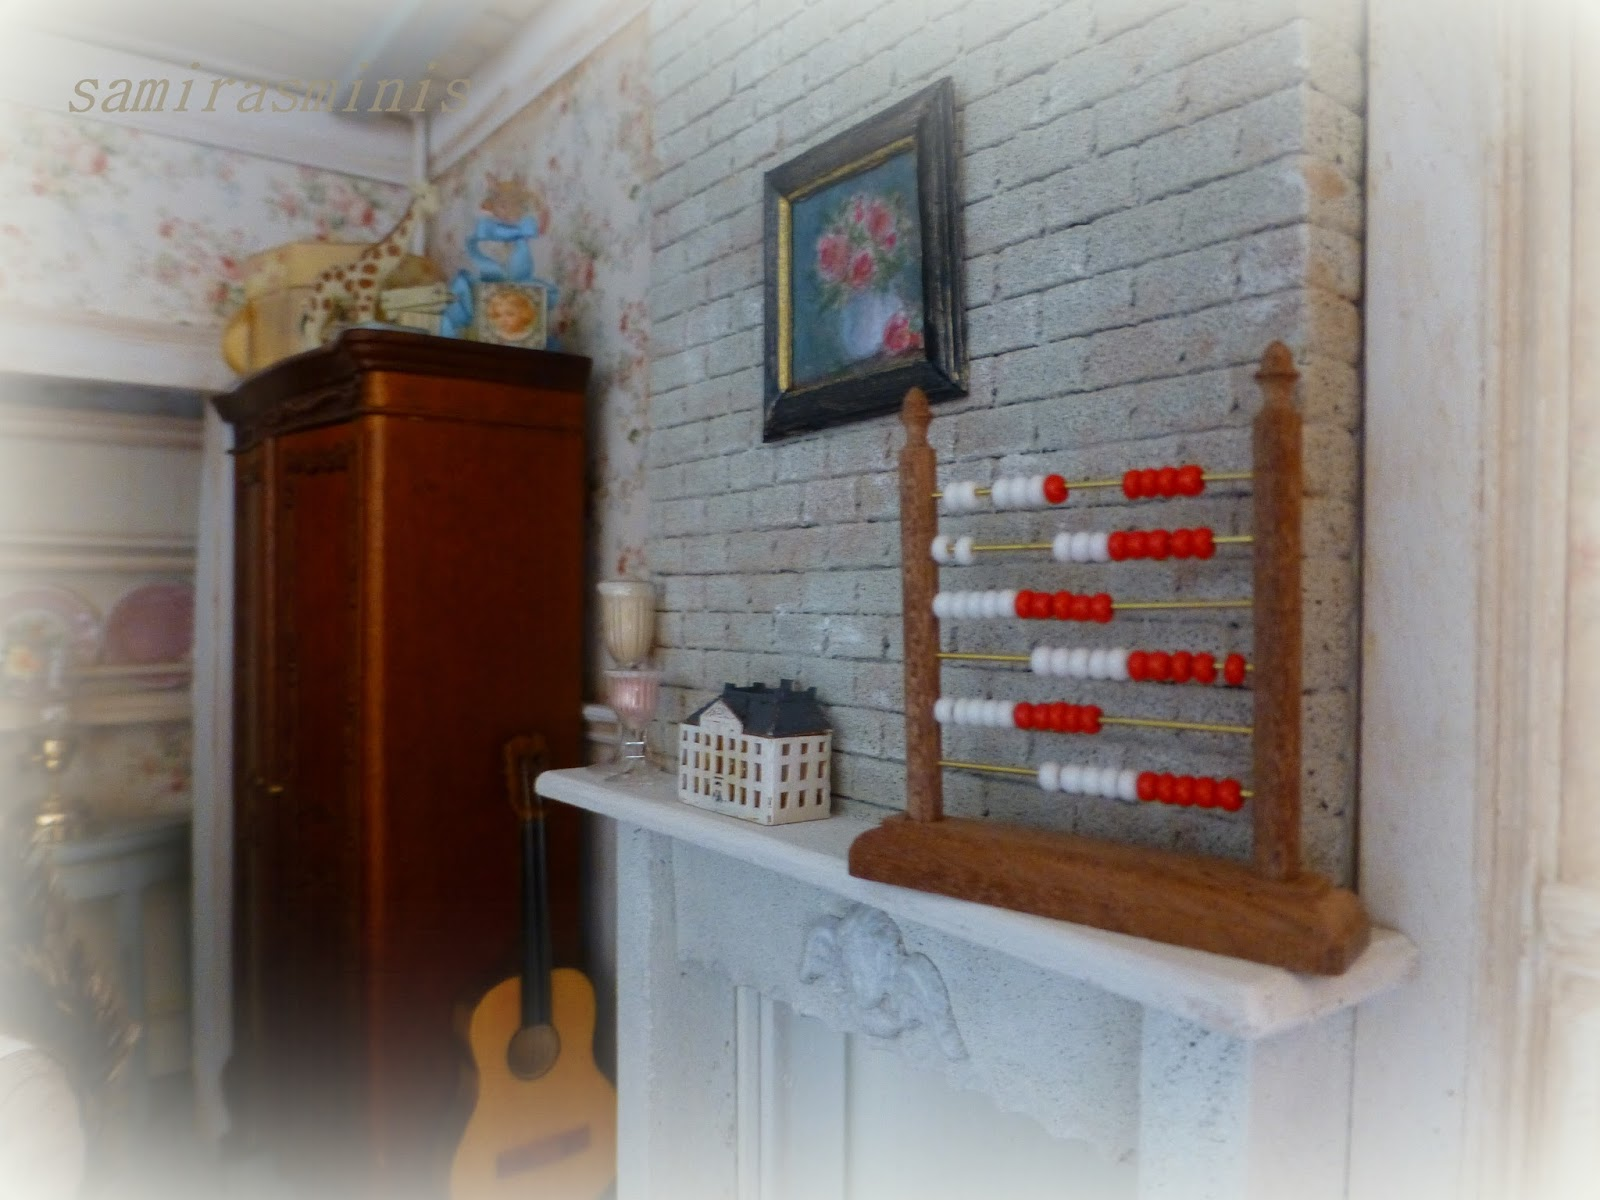 Samirasminis - Accessoire room ...